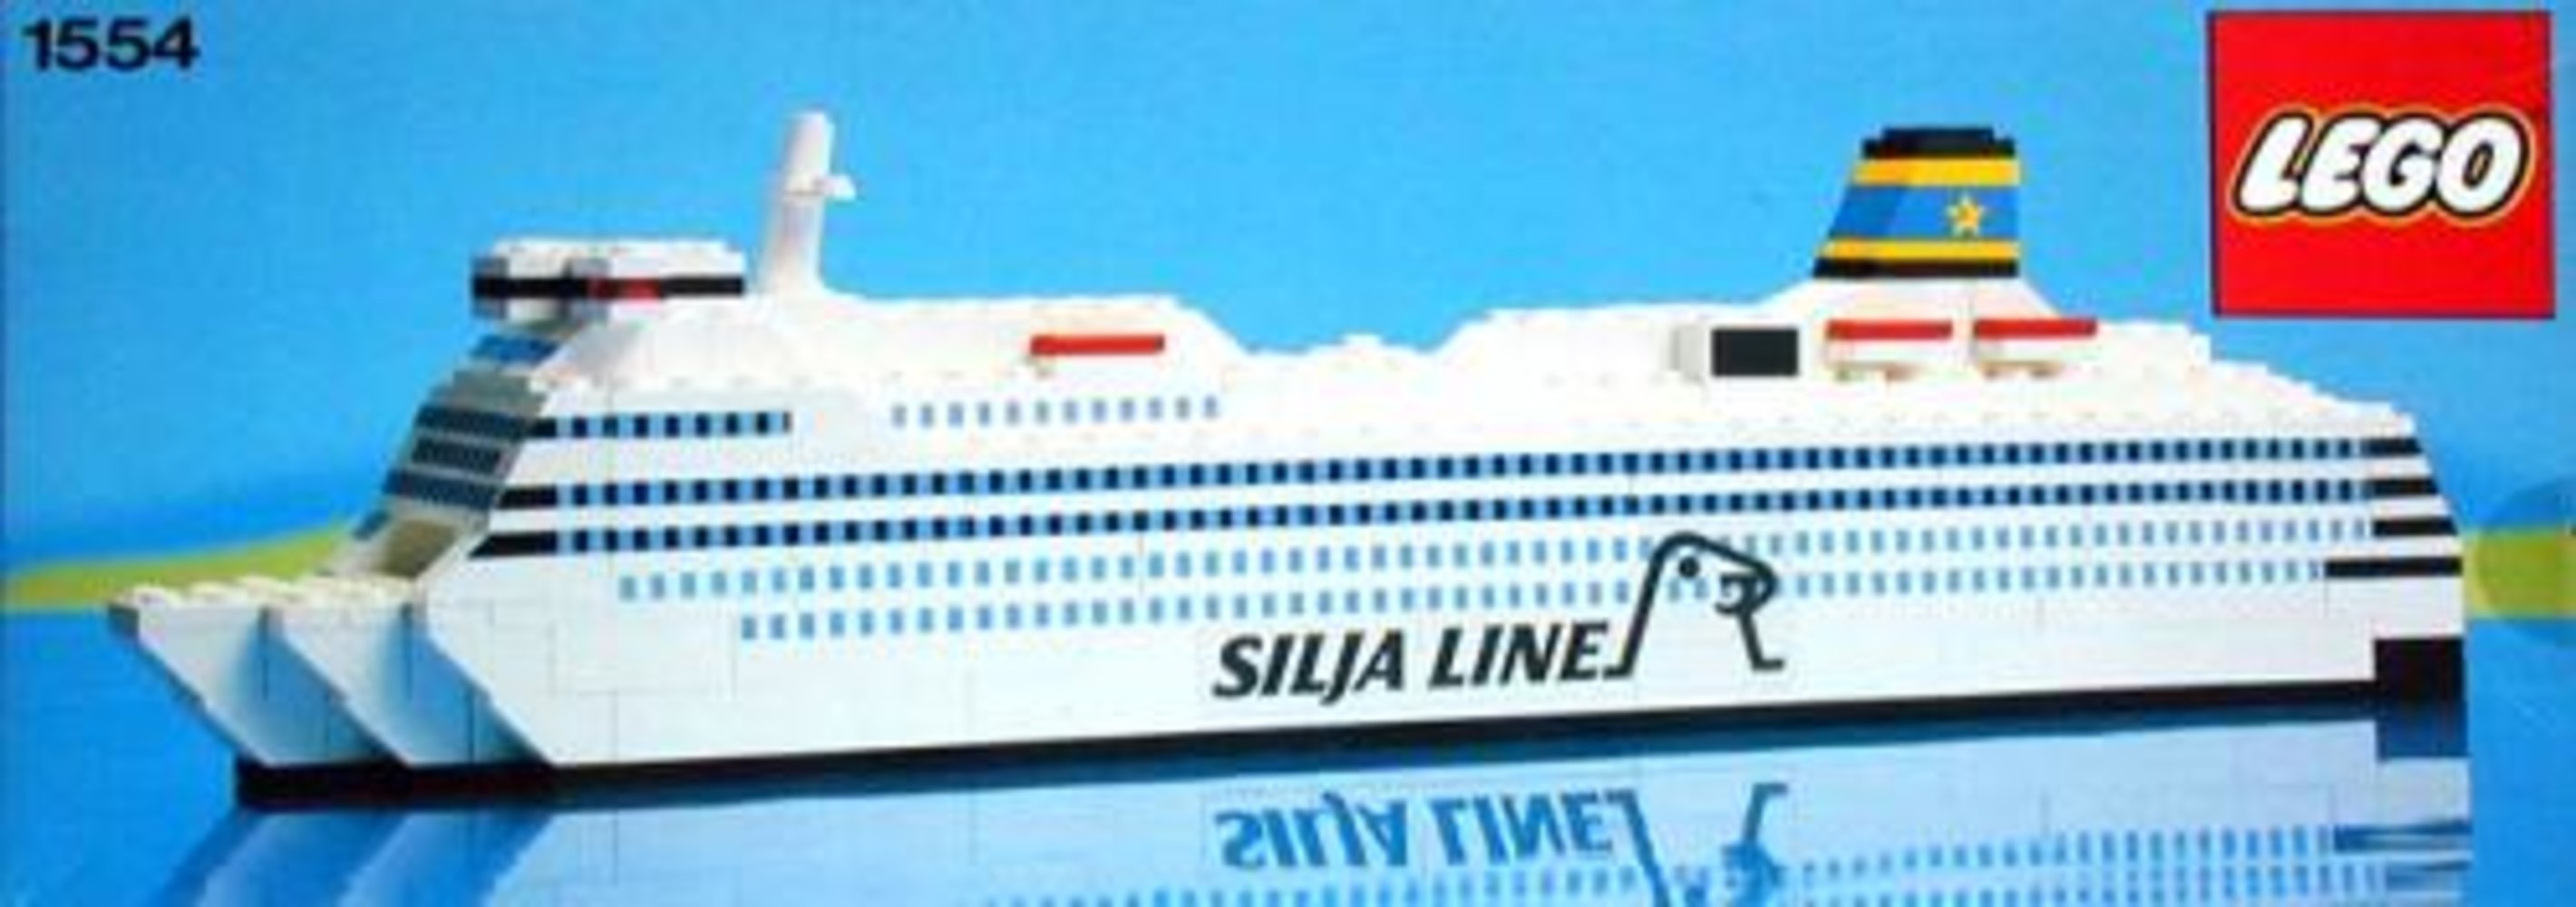 Silja Line Ferry